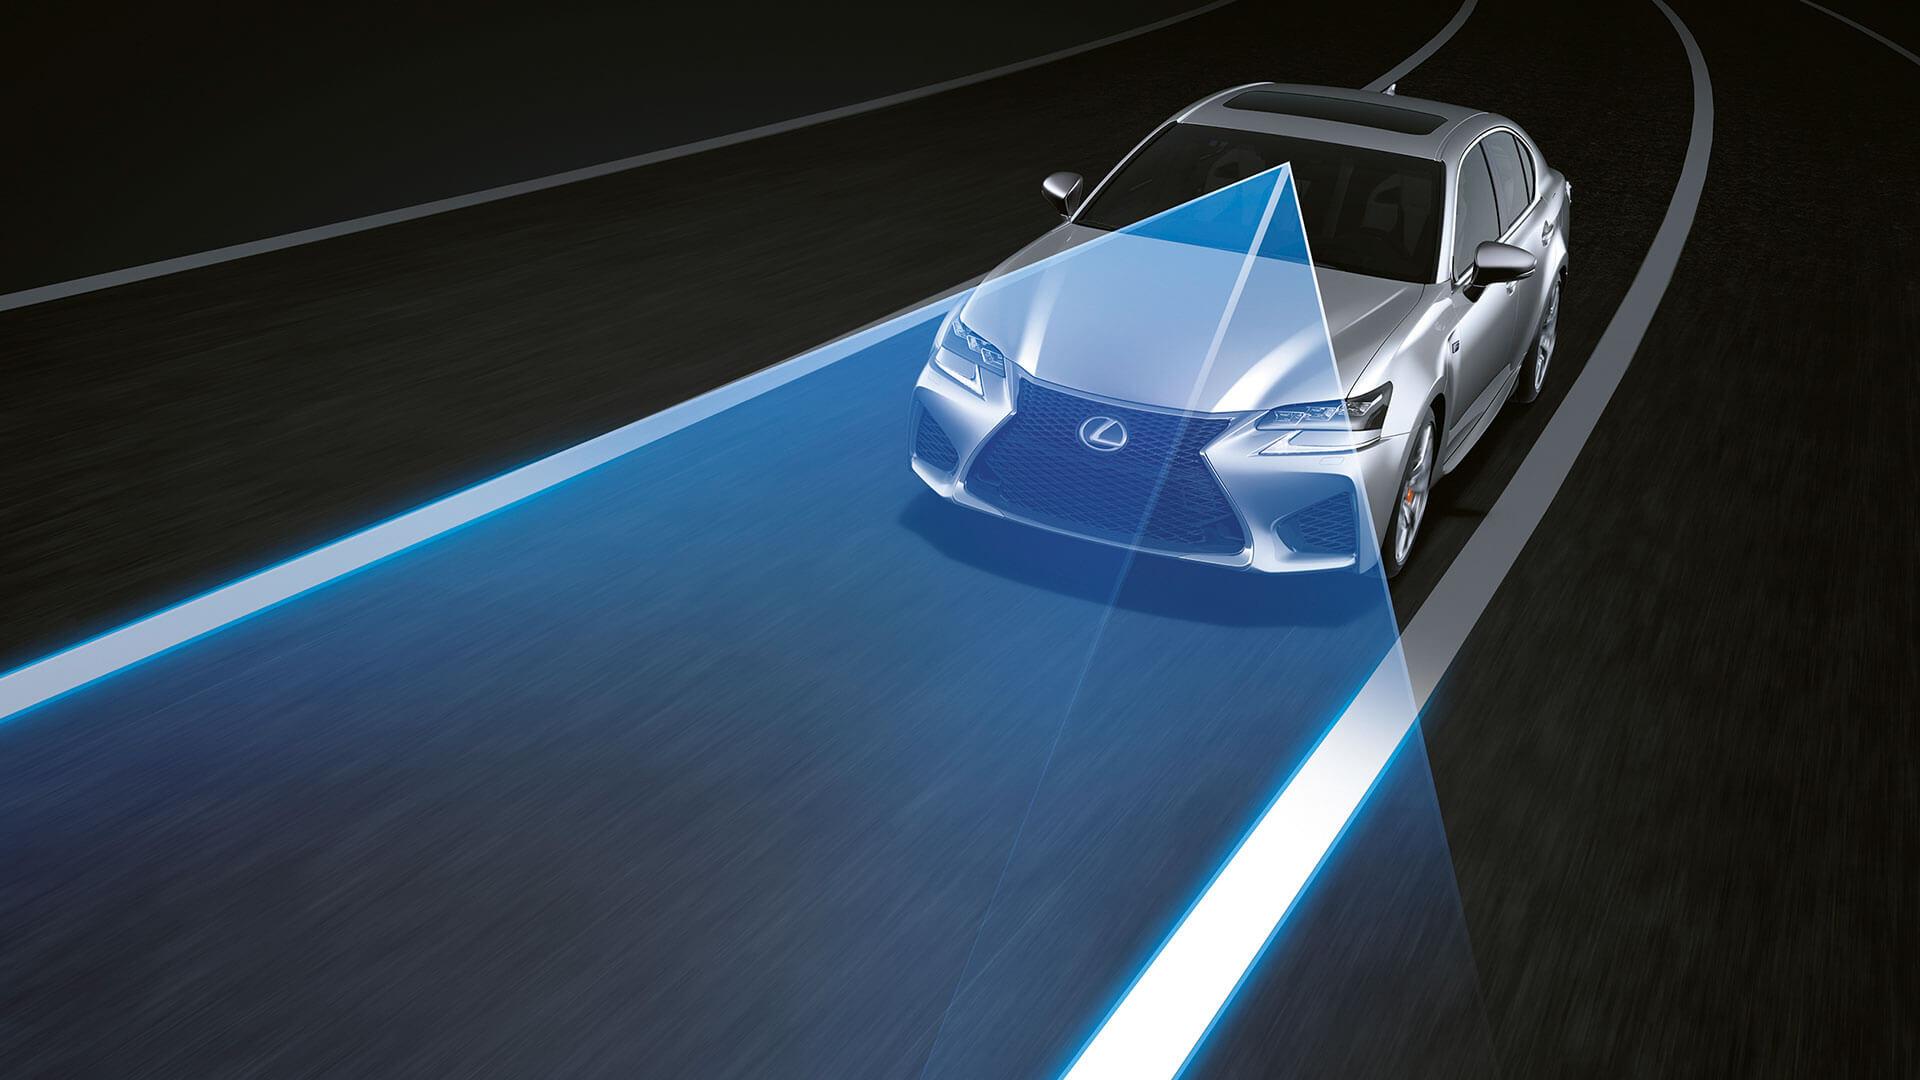 2017 lexus gs f features lane keeping assist